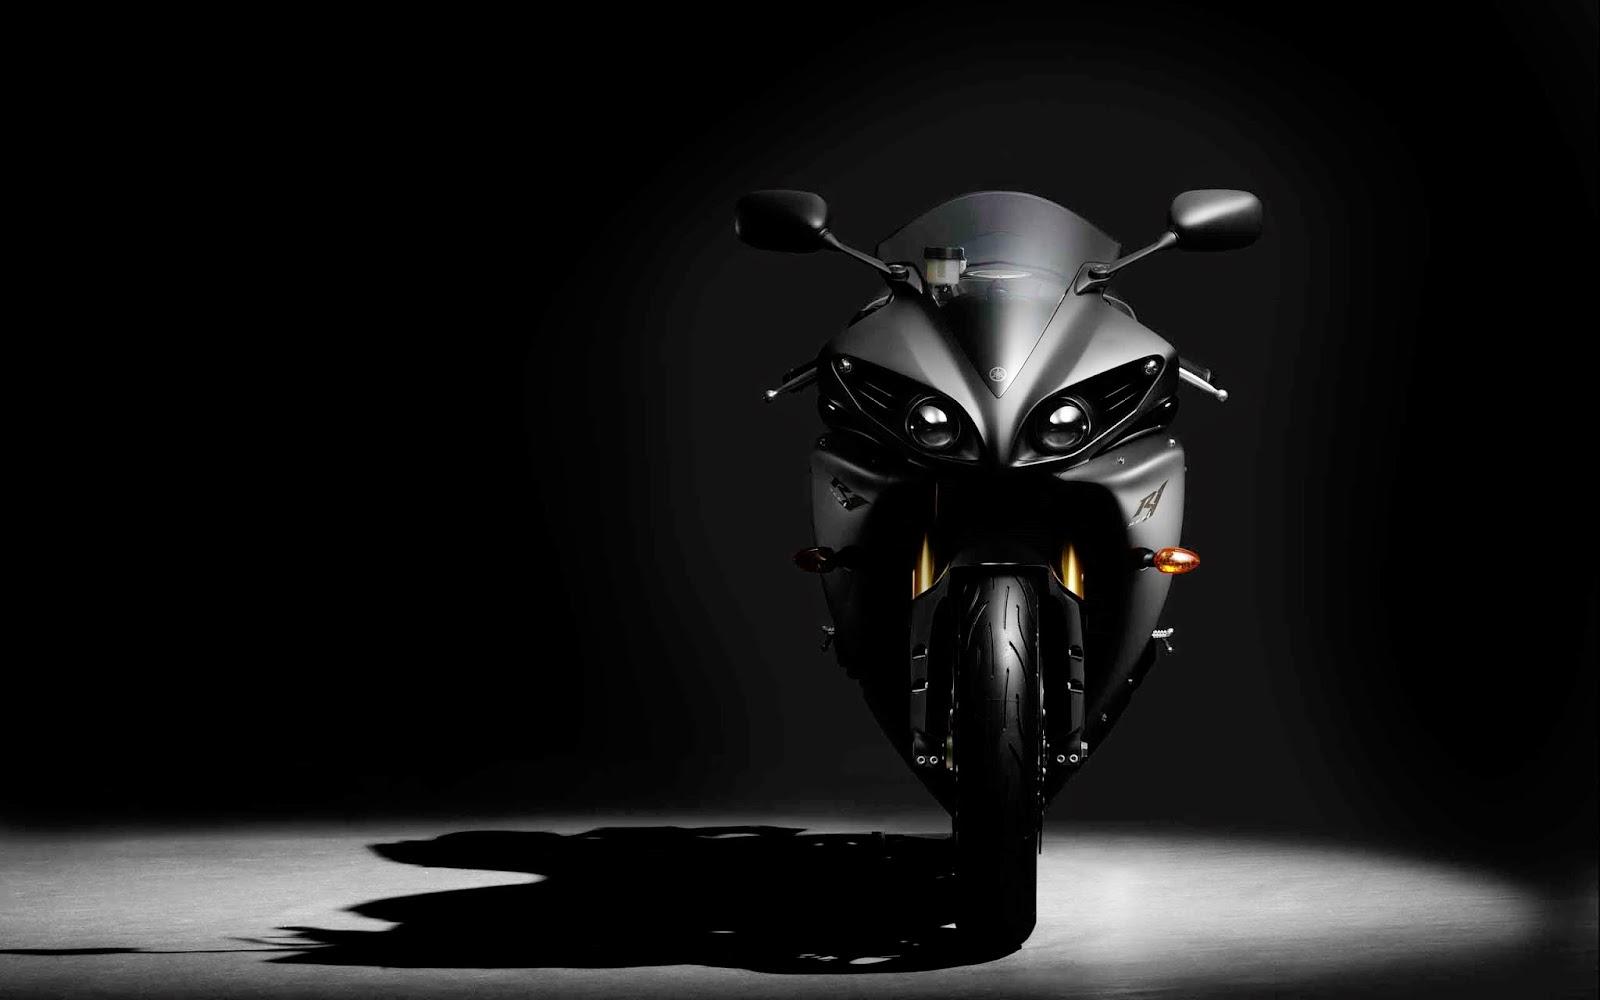 2012 Yamaha yzf r1 Wide